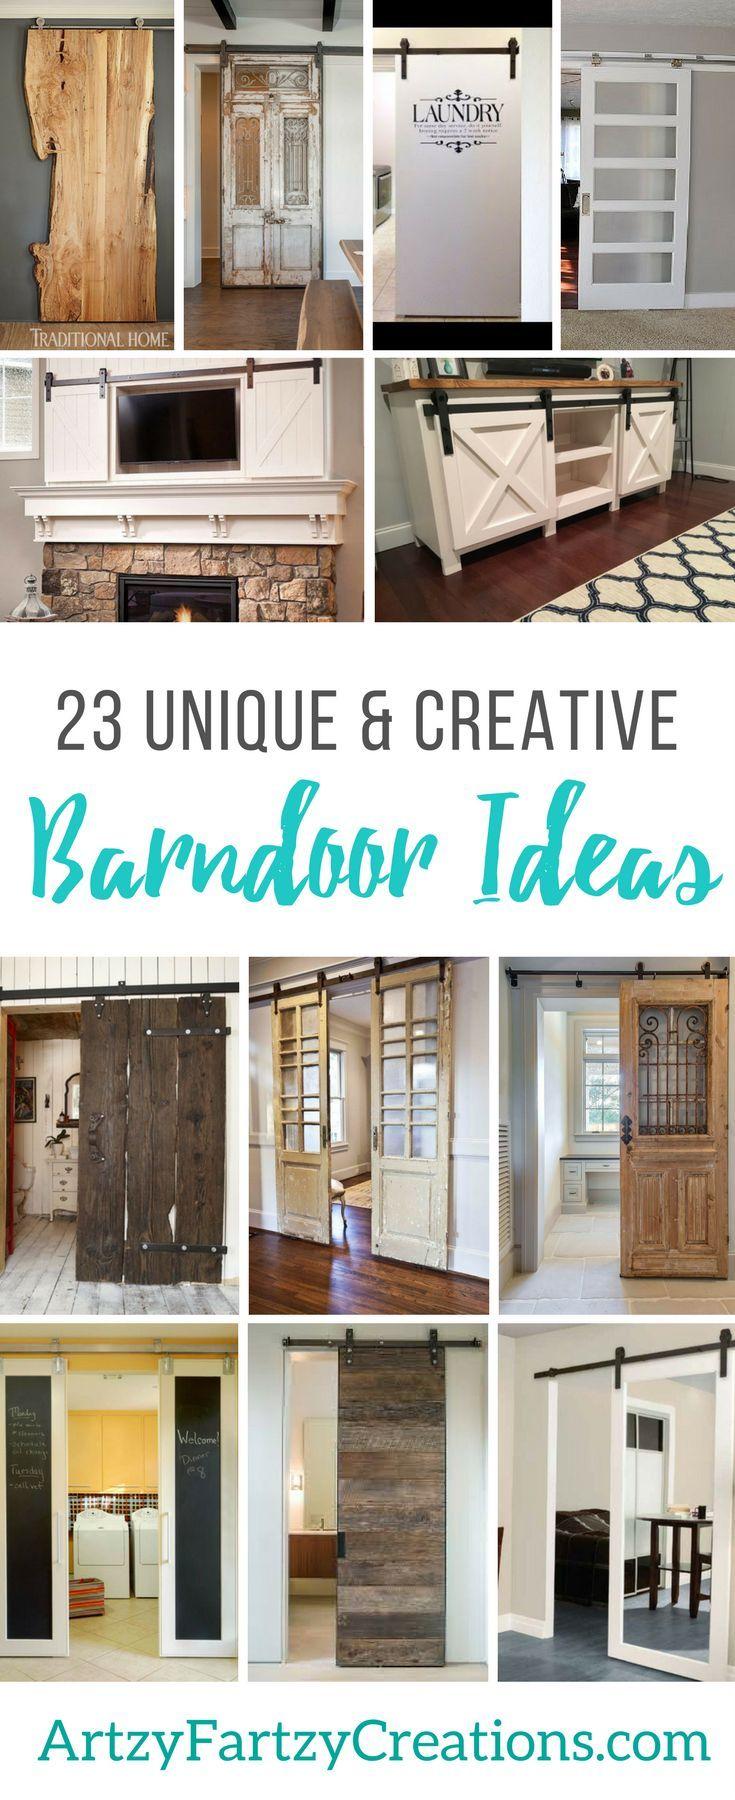 23 Barndoor Ideas for your Home - Farmhouse Doors - Bypass Barndoor  Furniture - Pantry -